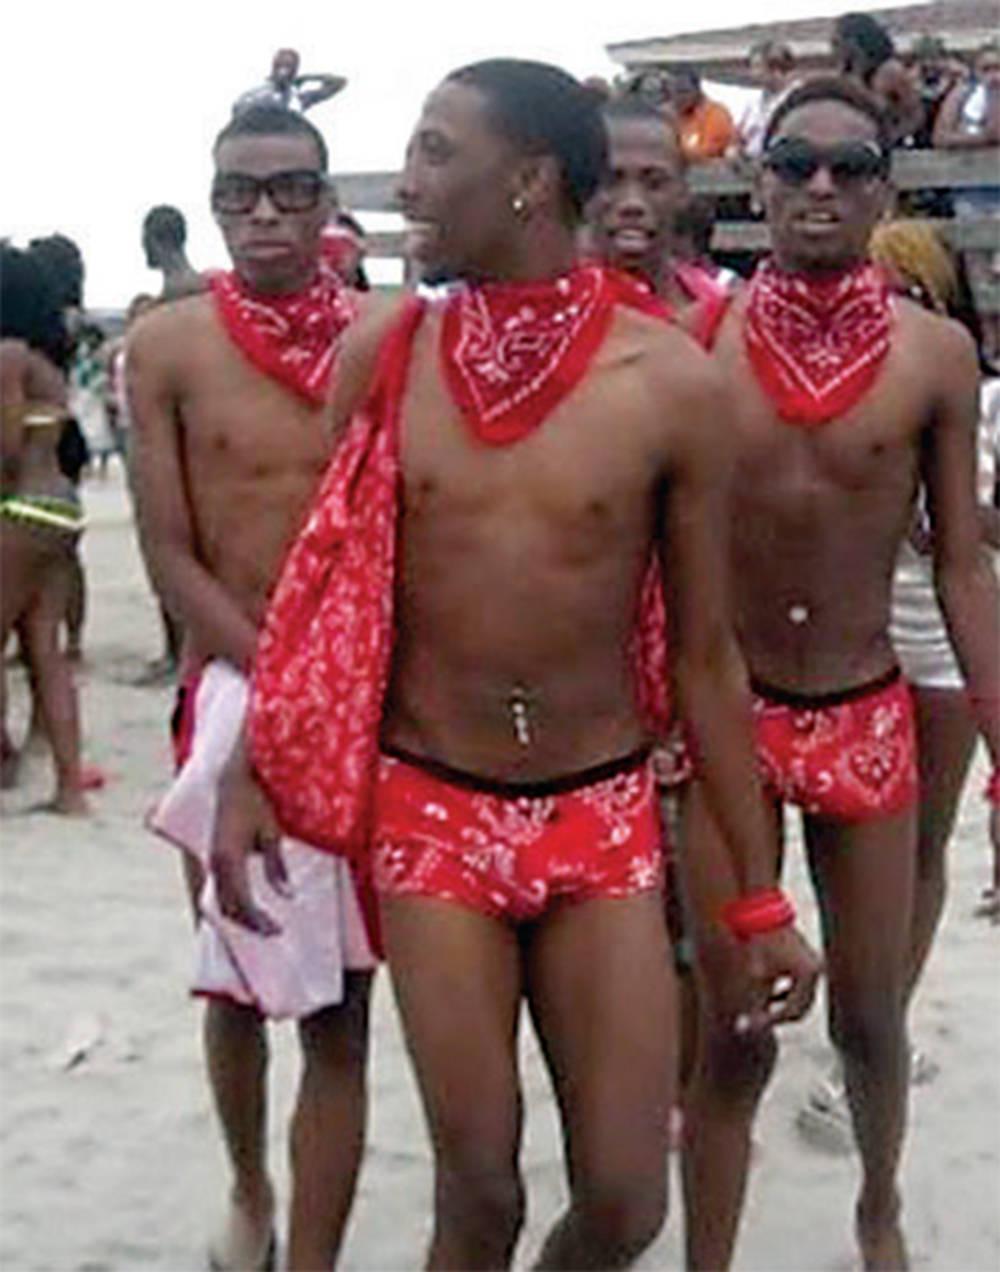 Gay Gang Im Umkleideraum